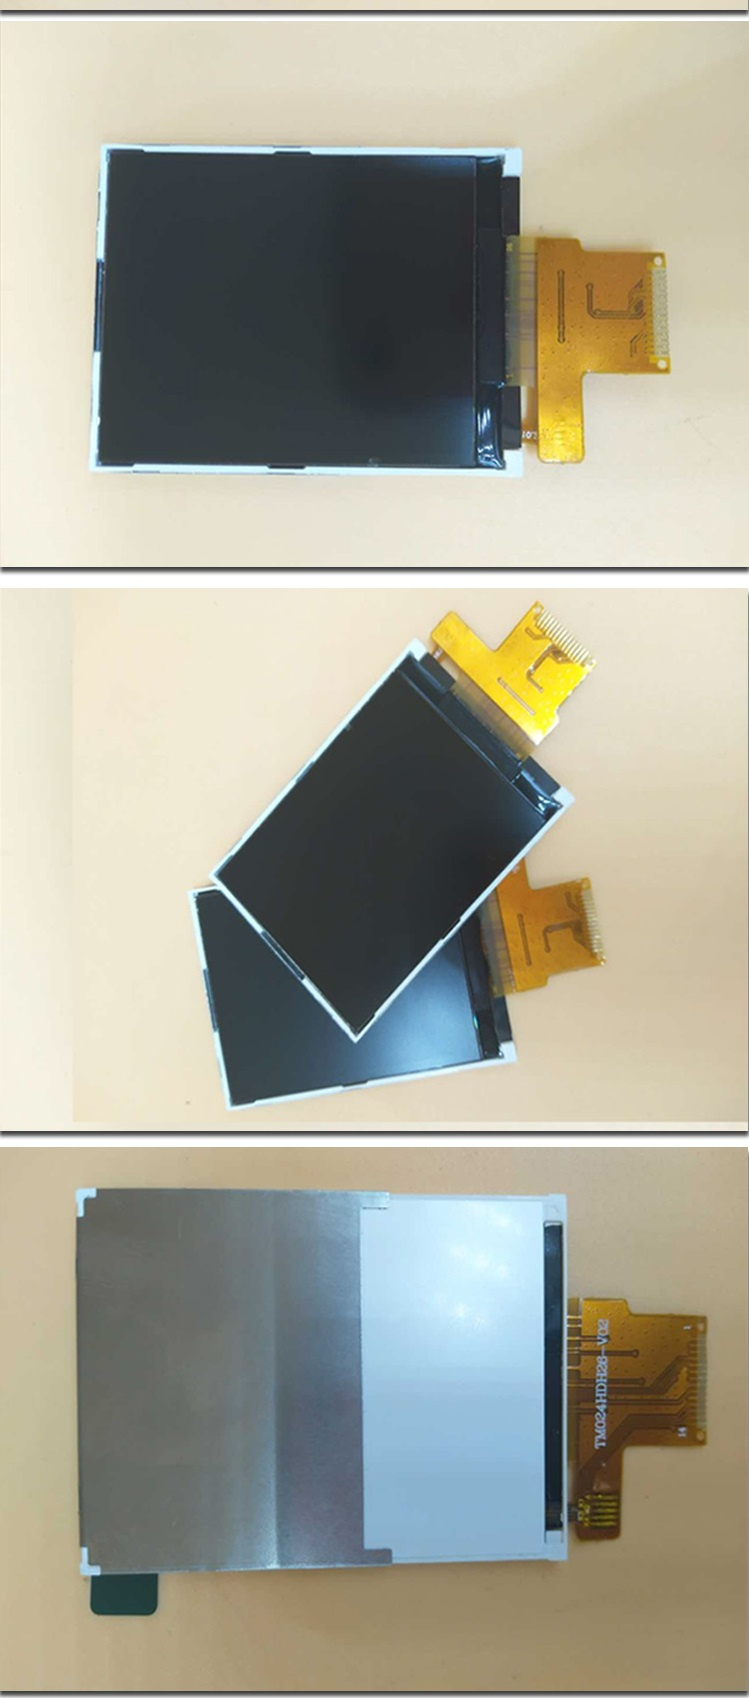 .4寸液晶屏定制SPI标准